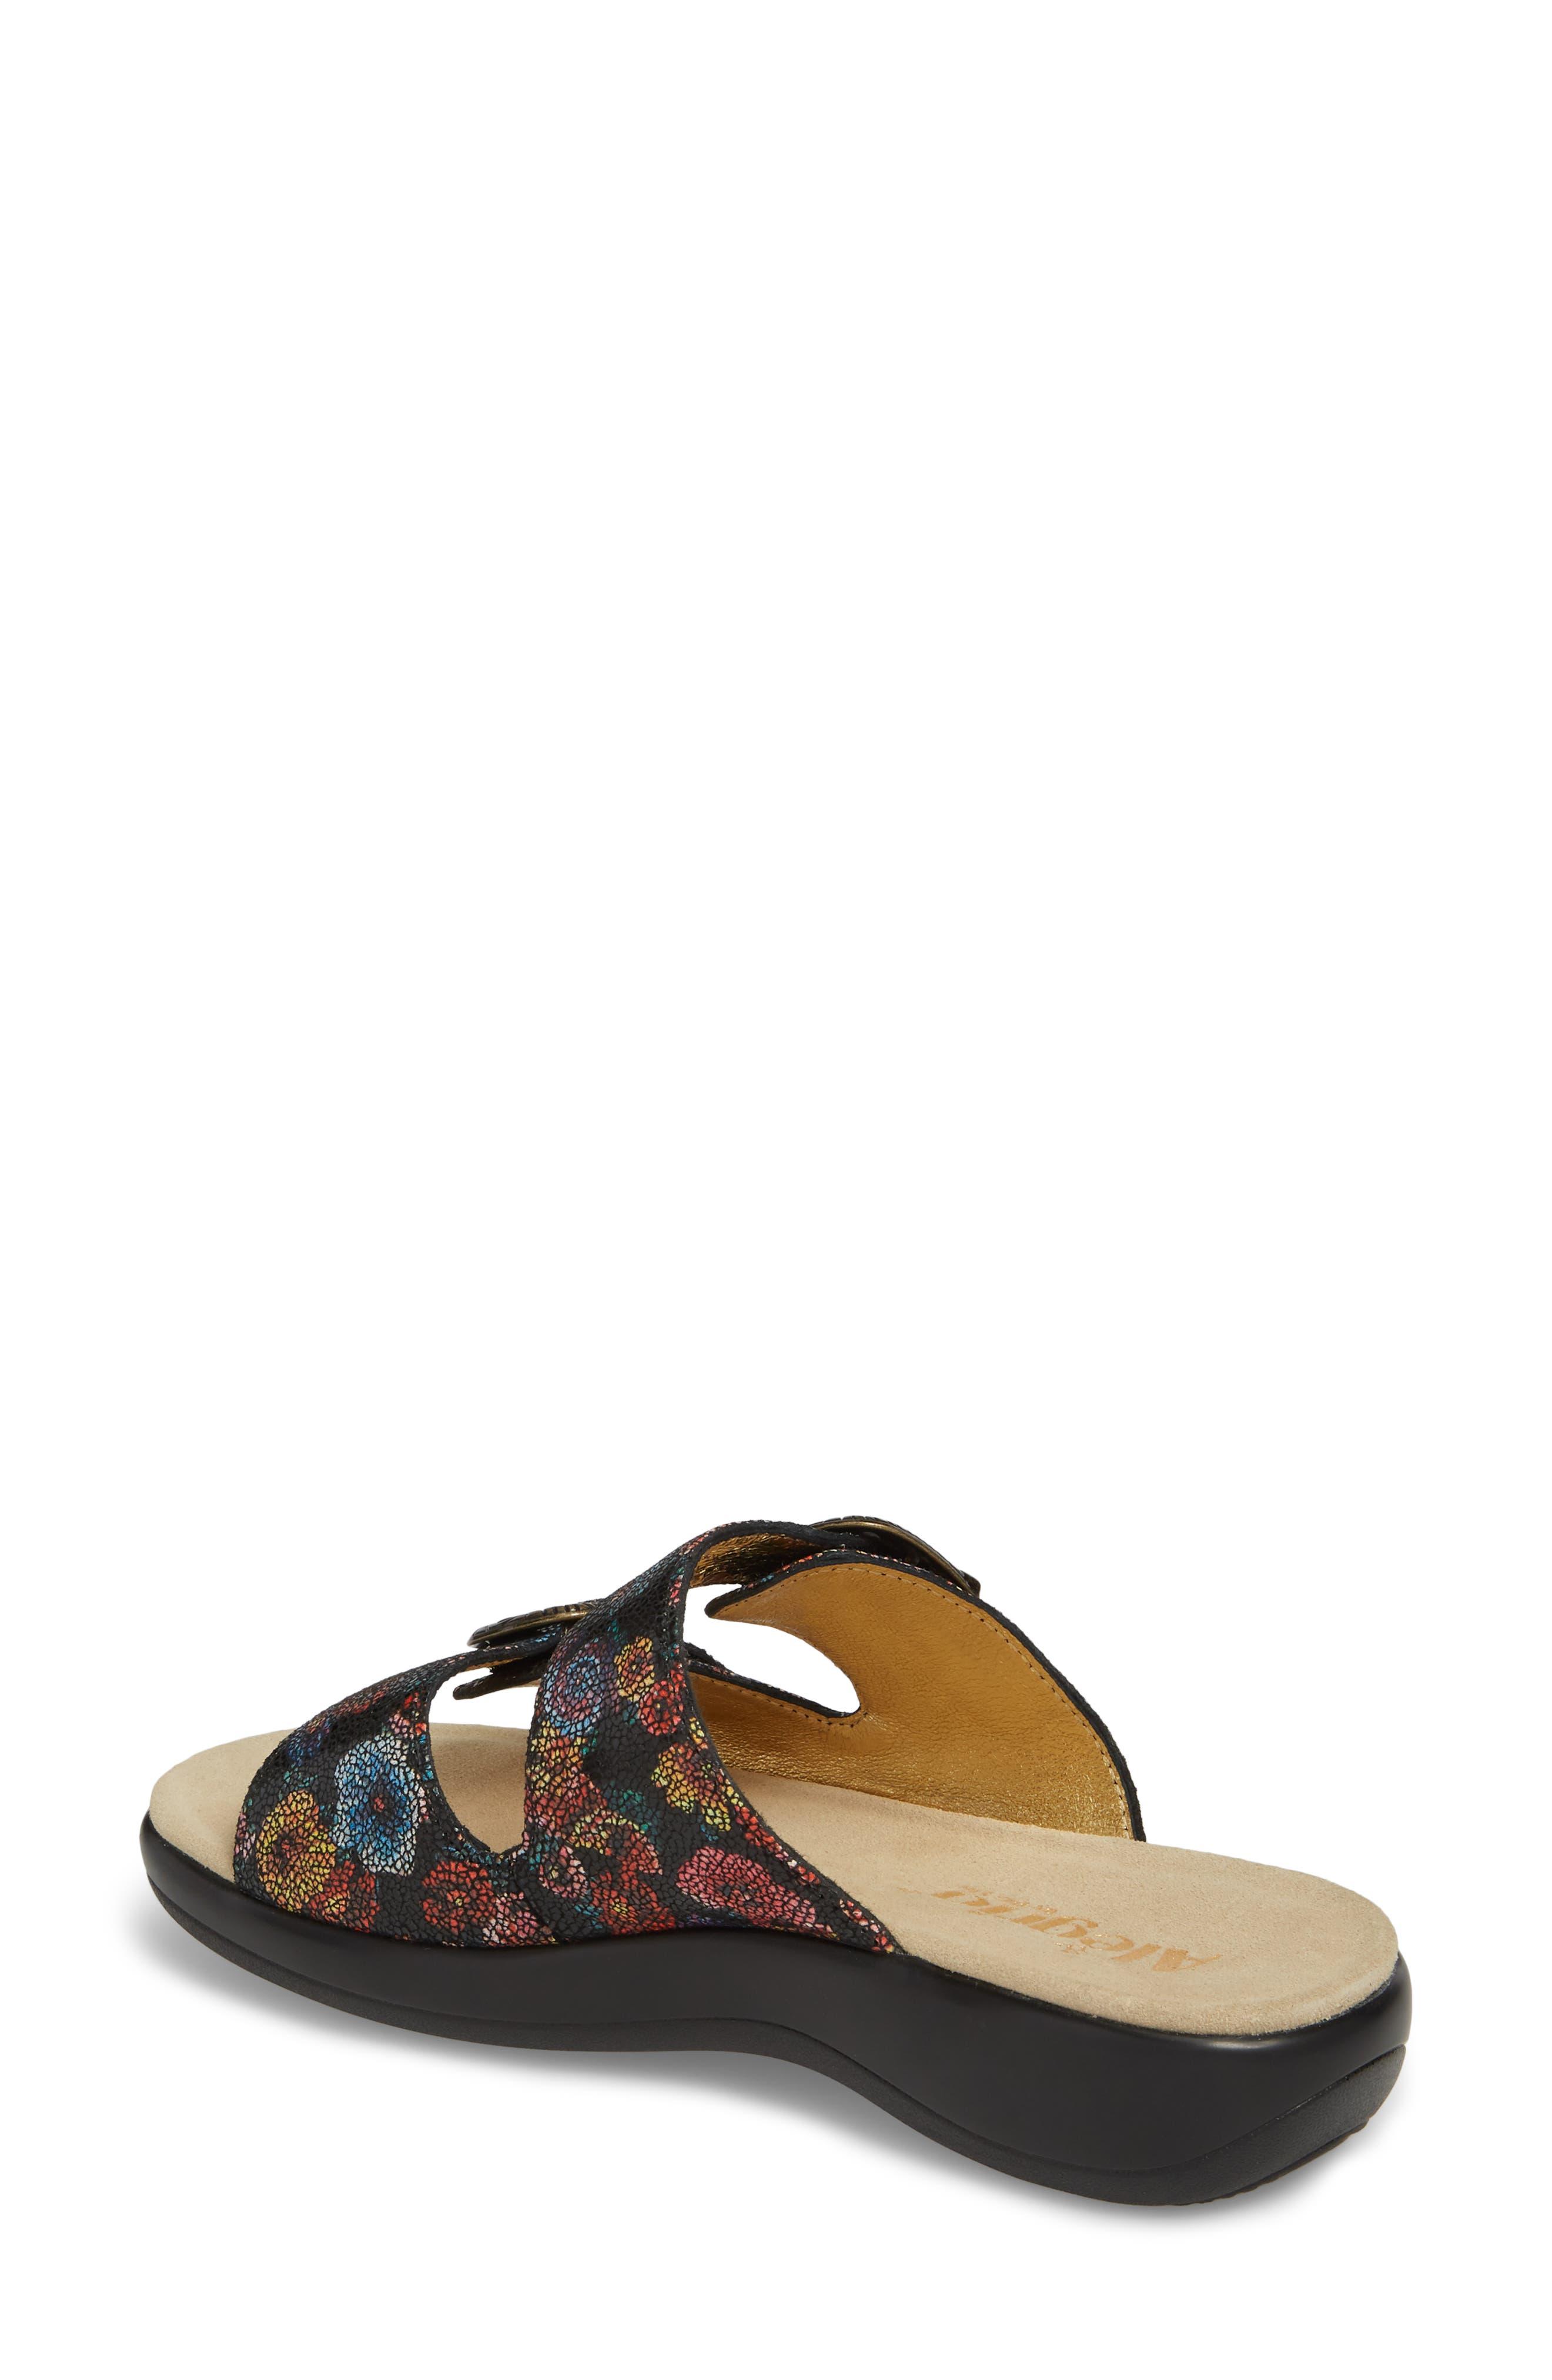 Jade Sandal,                             Alternate thumbnail 2, color,                             Florensic Files Leather